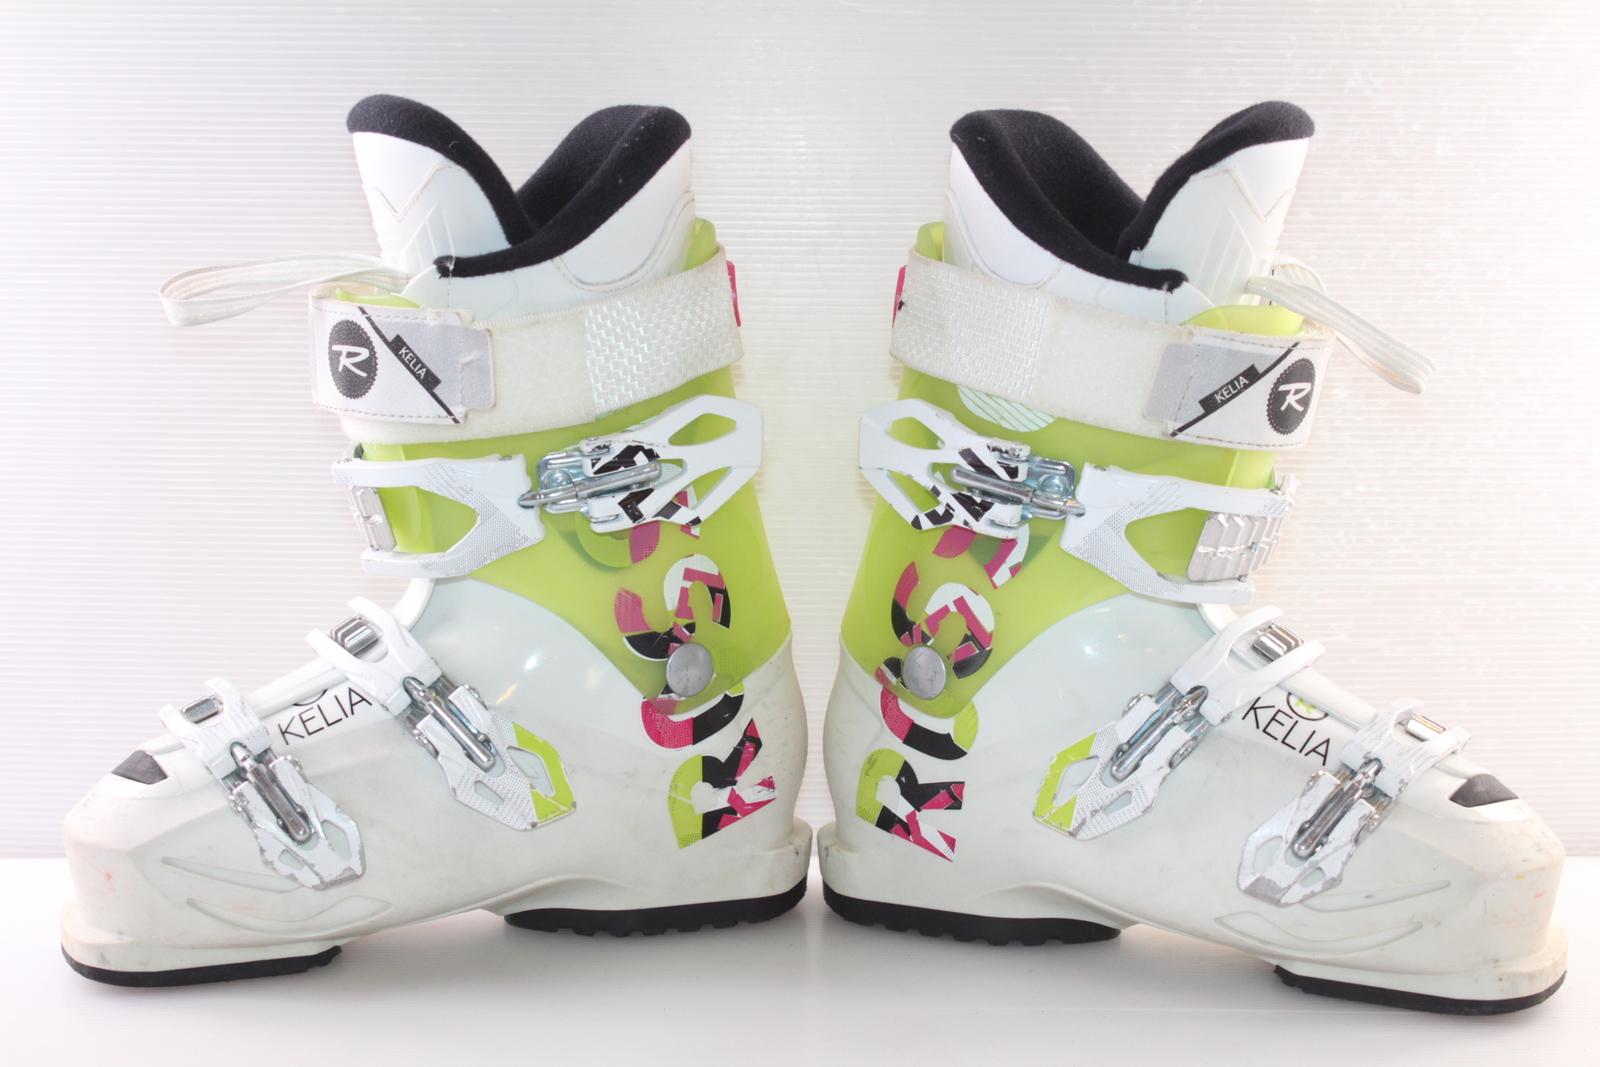 Dámské lyžáky Rossignol Kelia vel. EU38